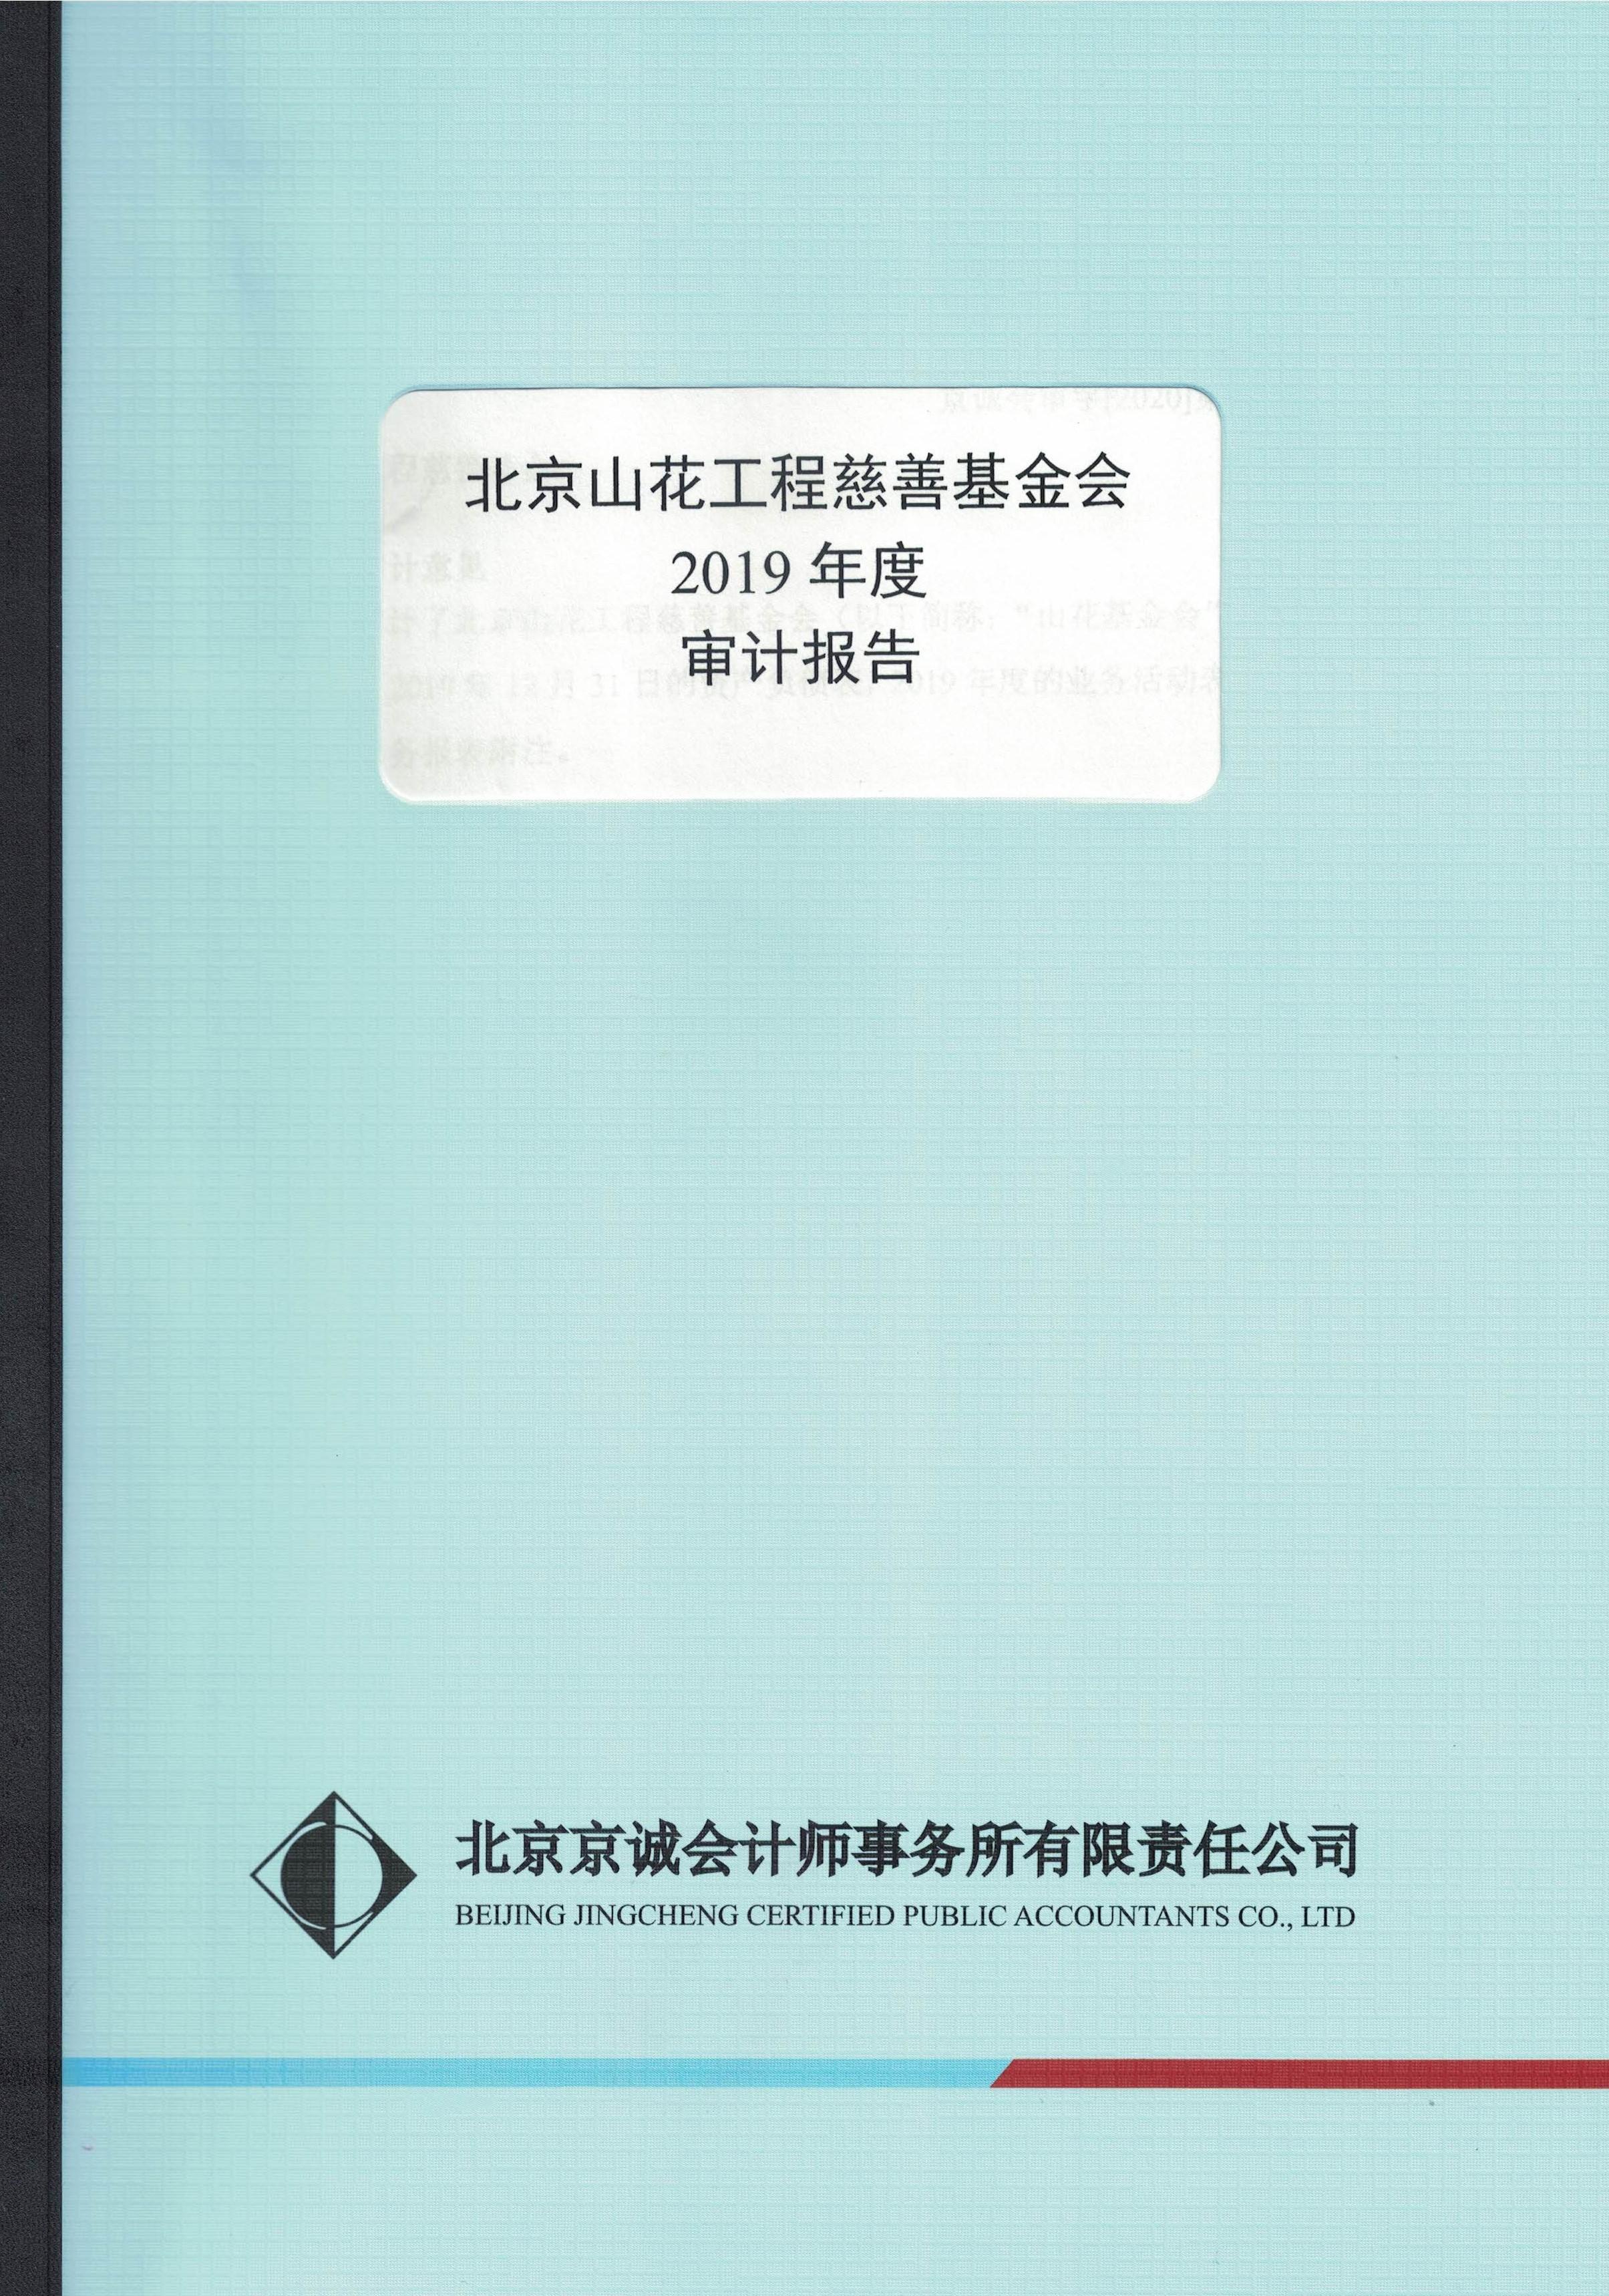 CCF20210114_0001_页面_01